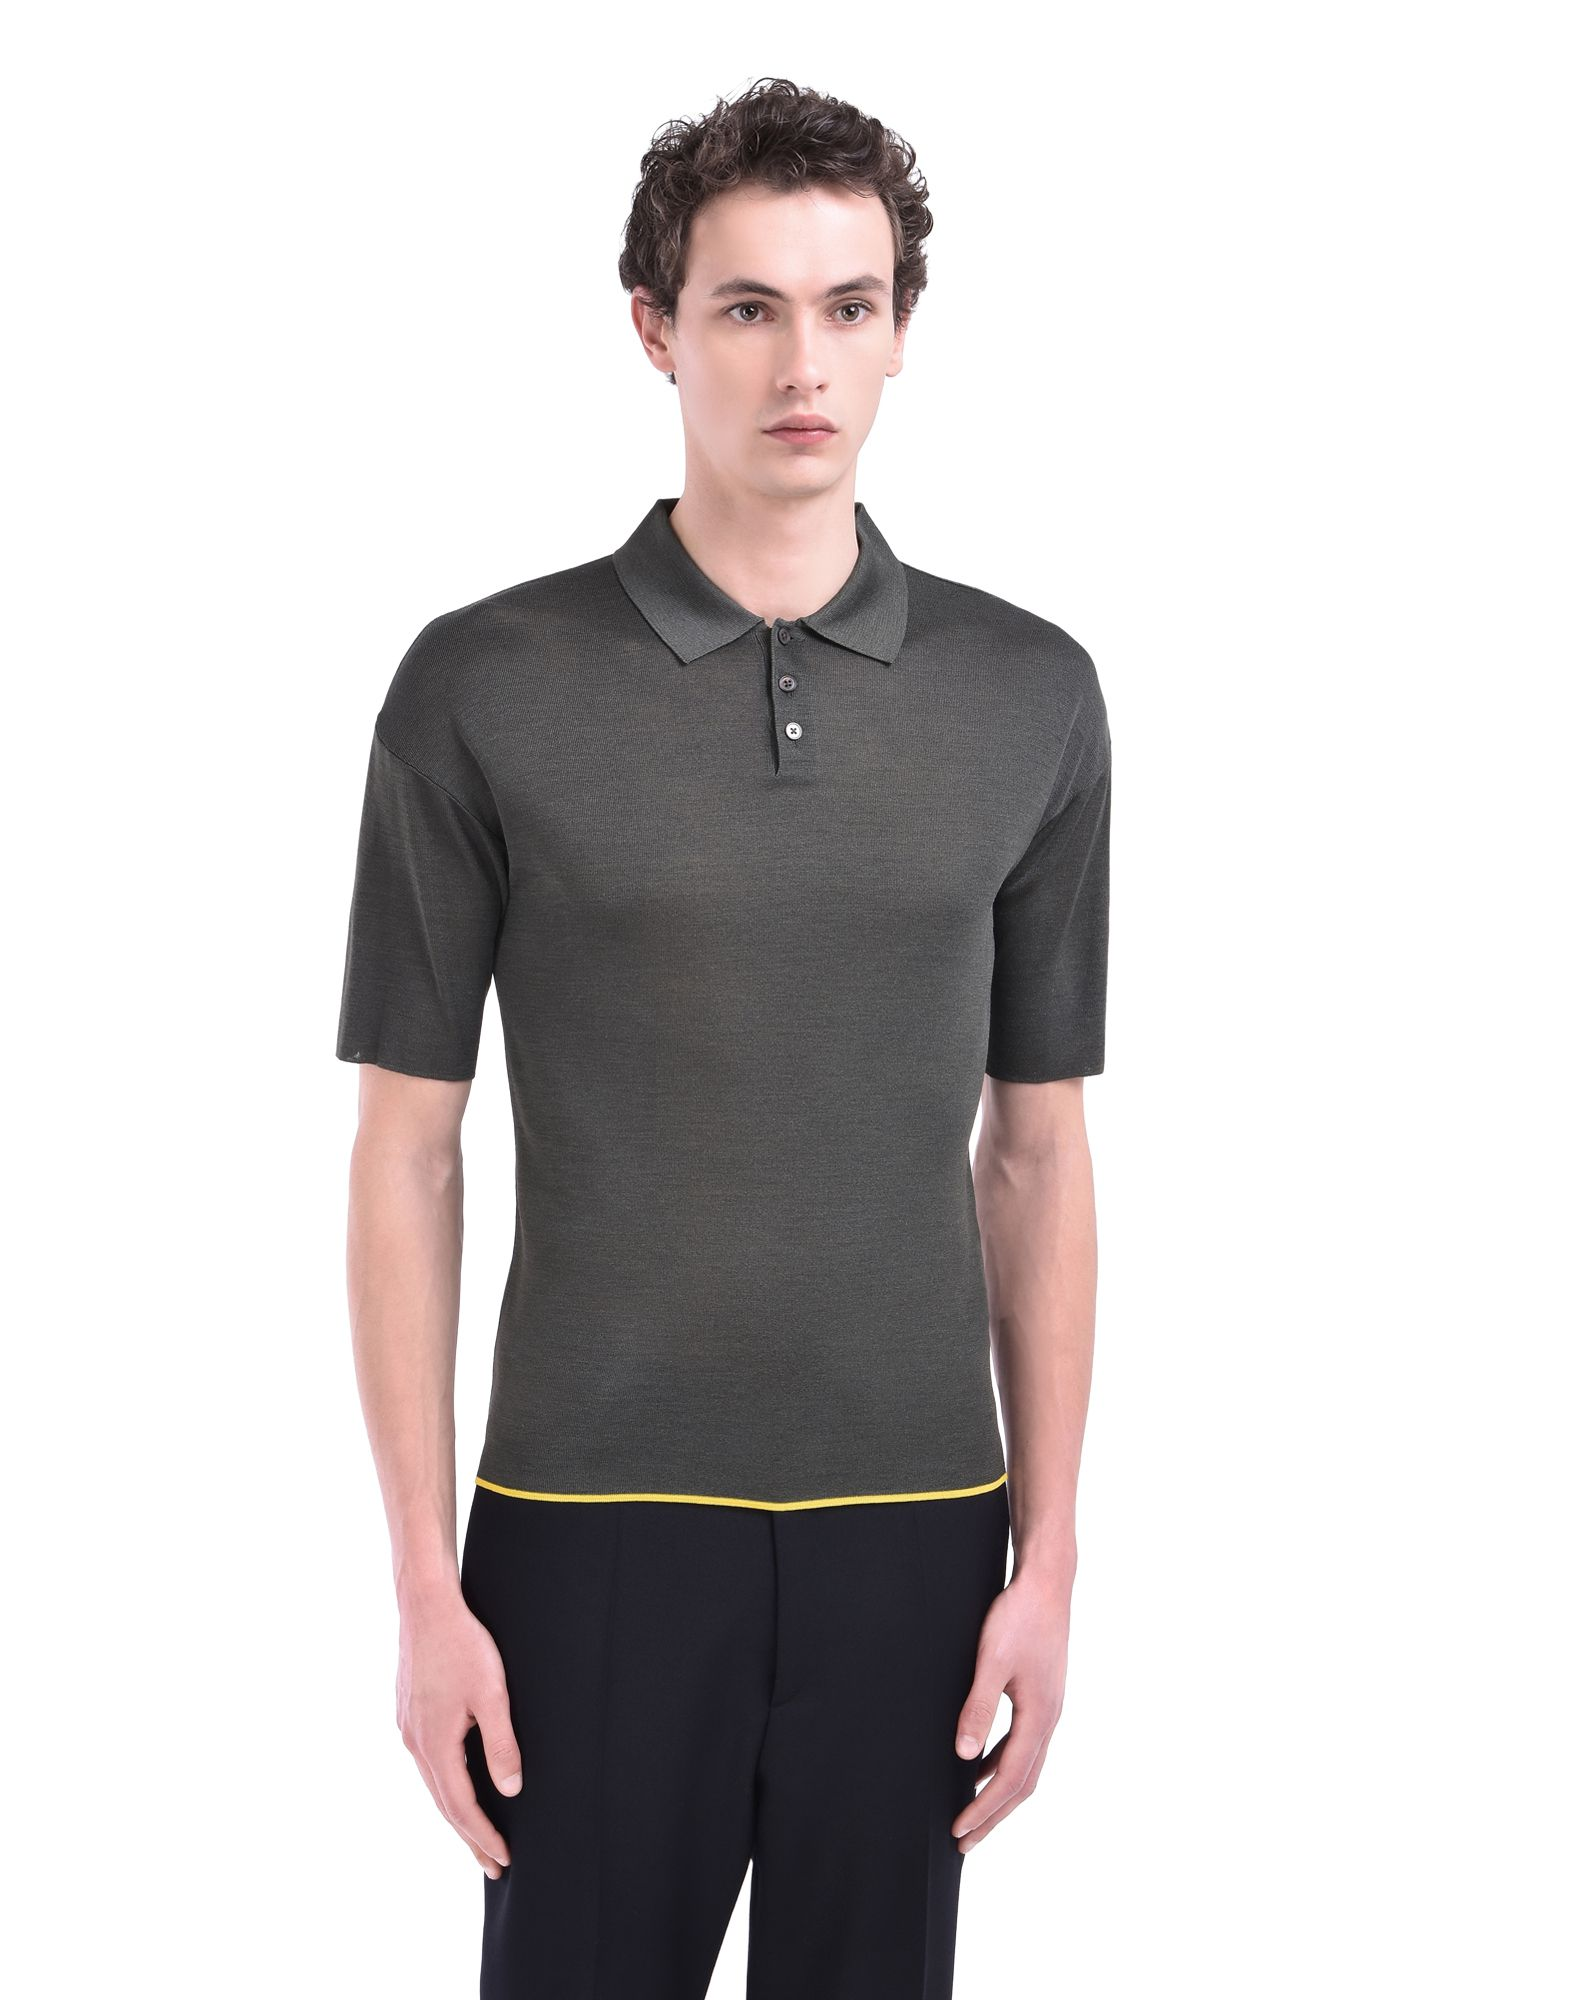 Polo shirt - JIL SANDER Online Store